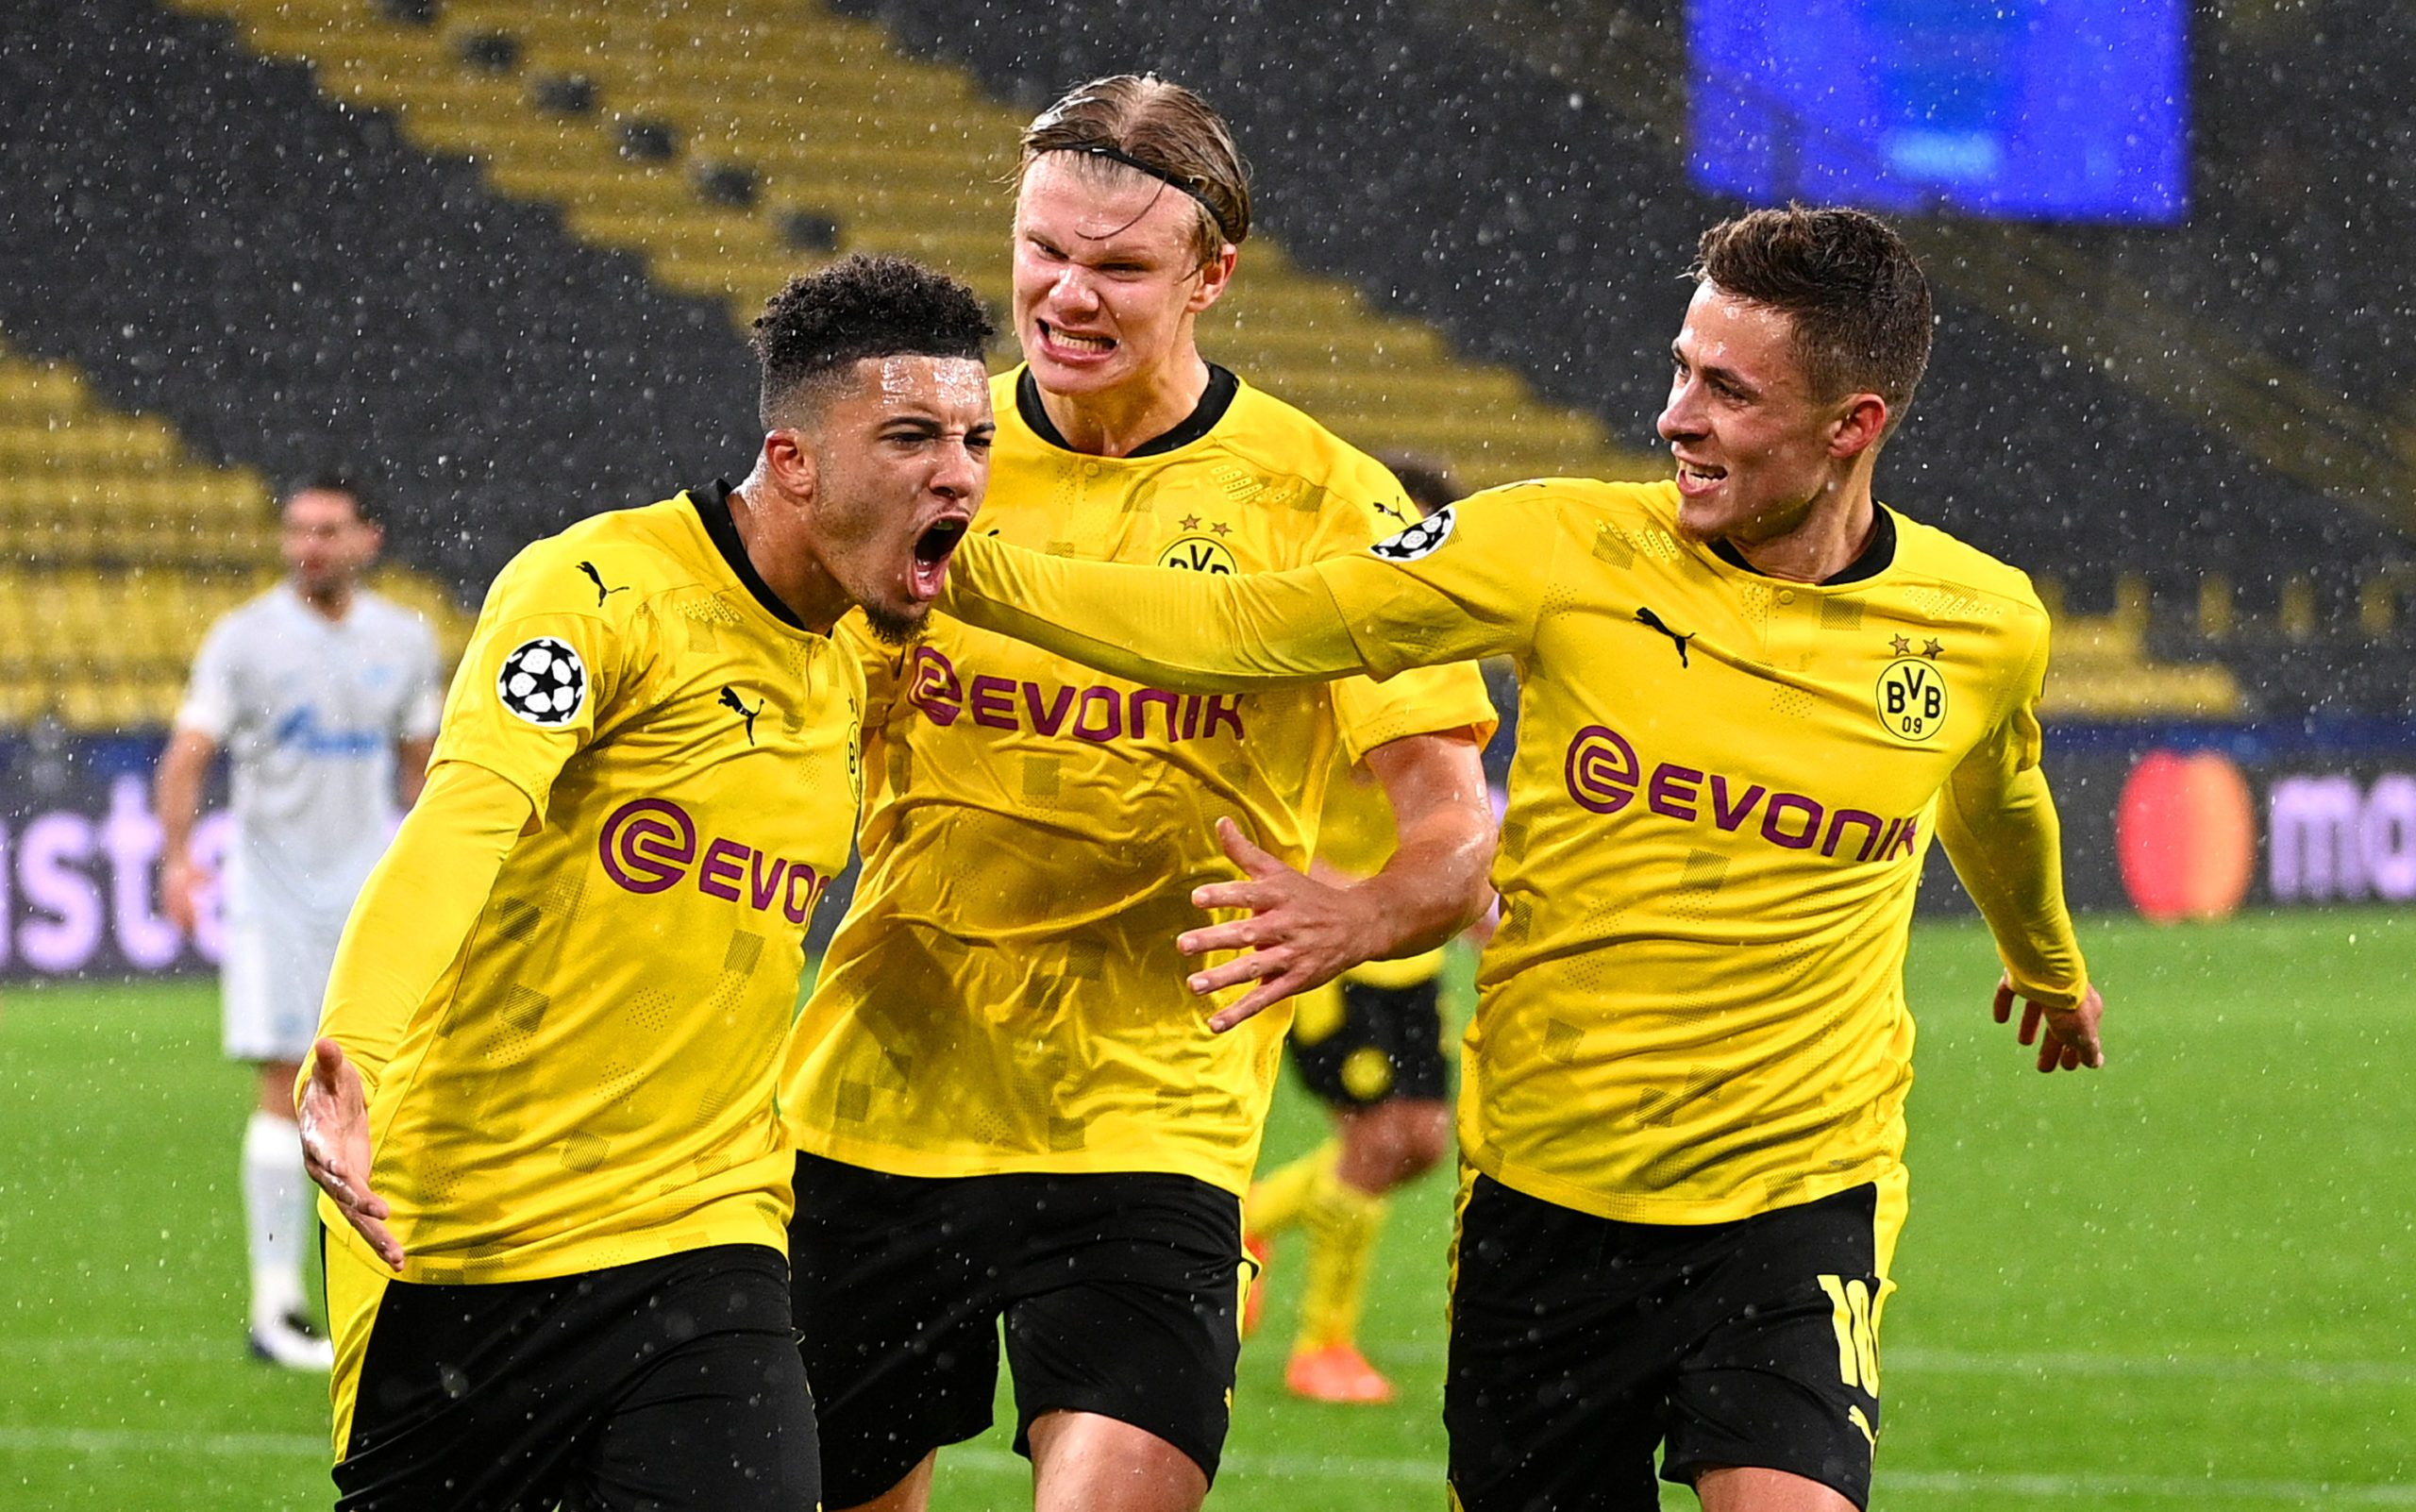 Bundesliga Jadon Sancho And Erling Haaland On Target As Borussia Dortmund Beat Zenit Saint Petersburg